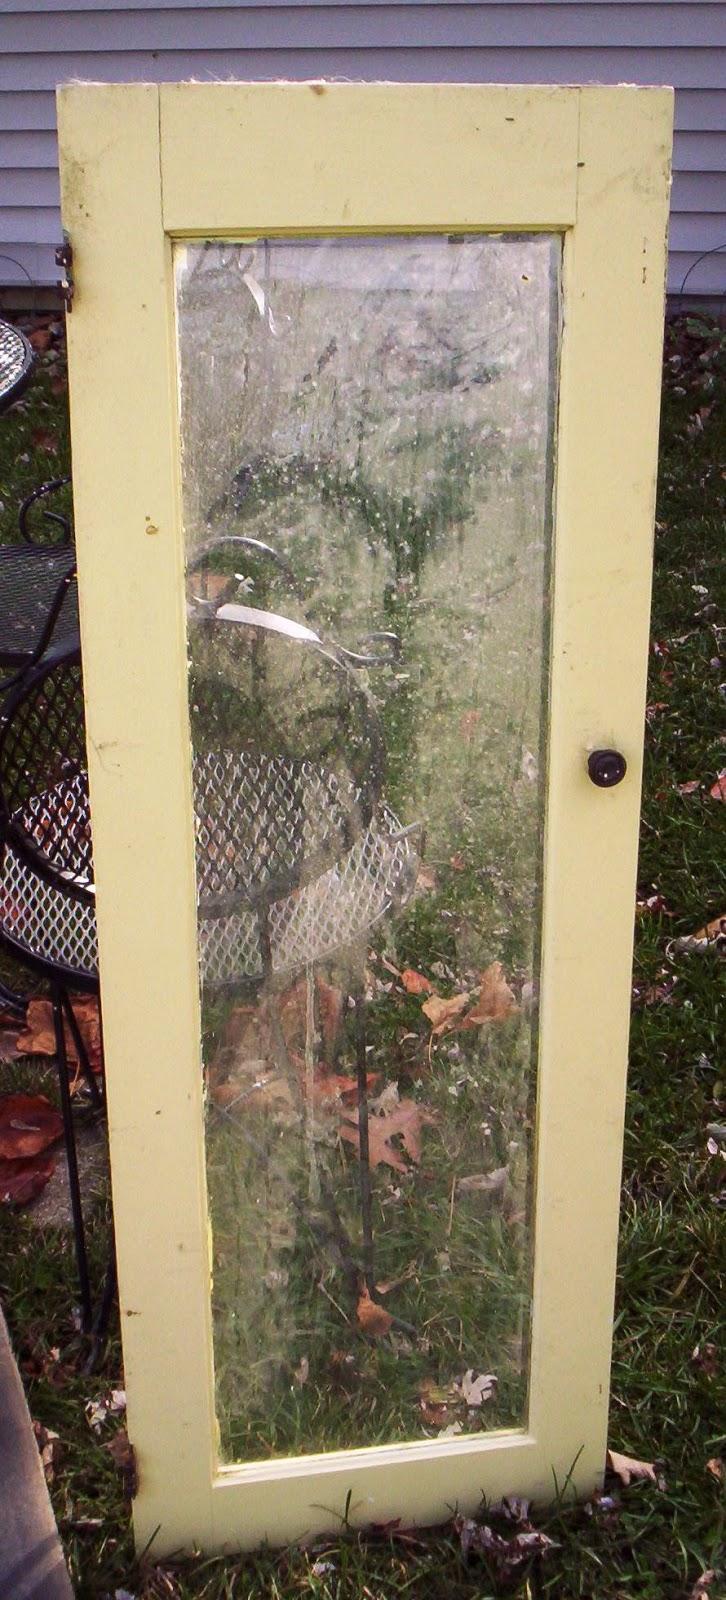 My Painted Stuff: Repurposed window